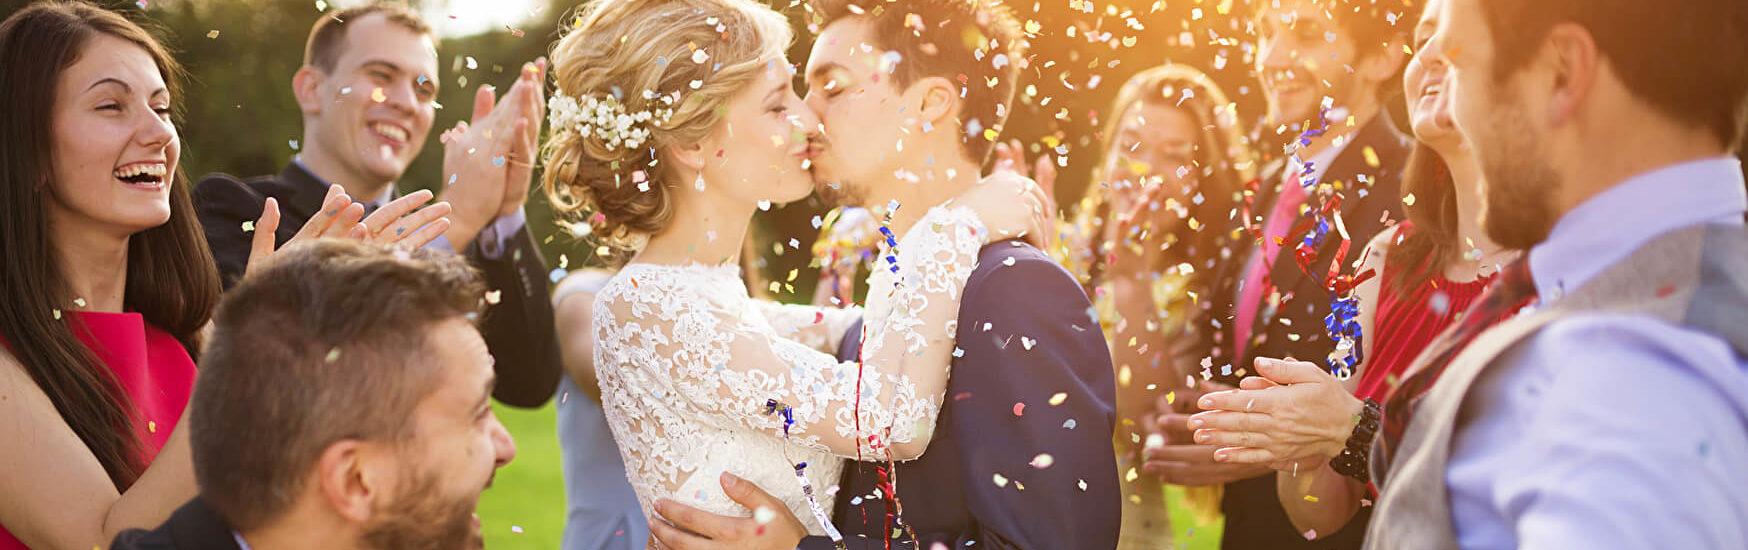 Hochzeitspaar | © panthermedia.net /halfpoint